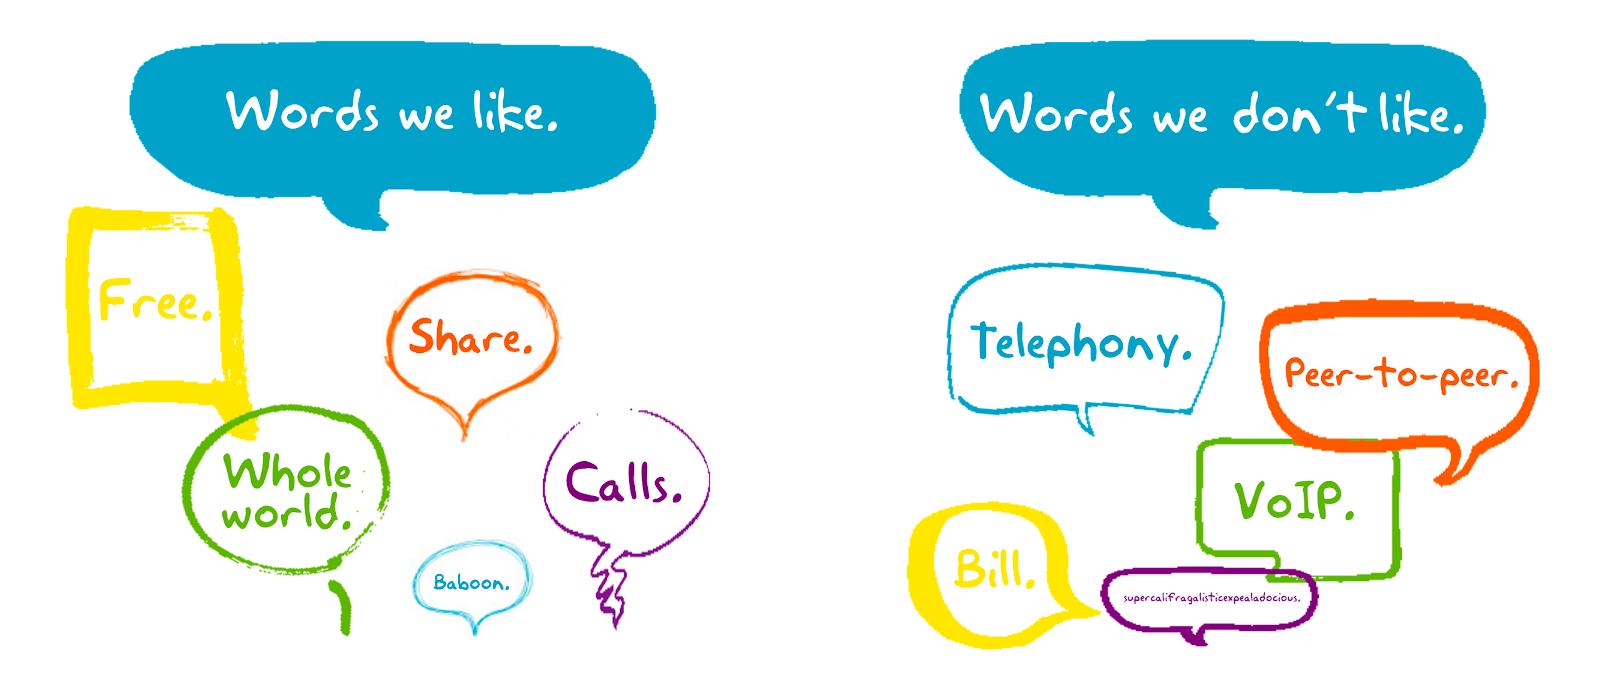 brand-book_termes-communication_Skype-exemple